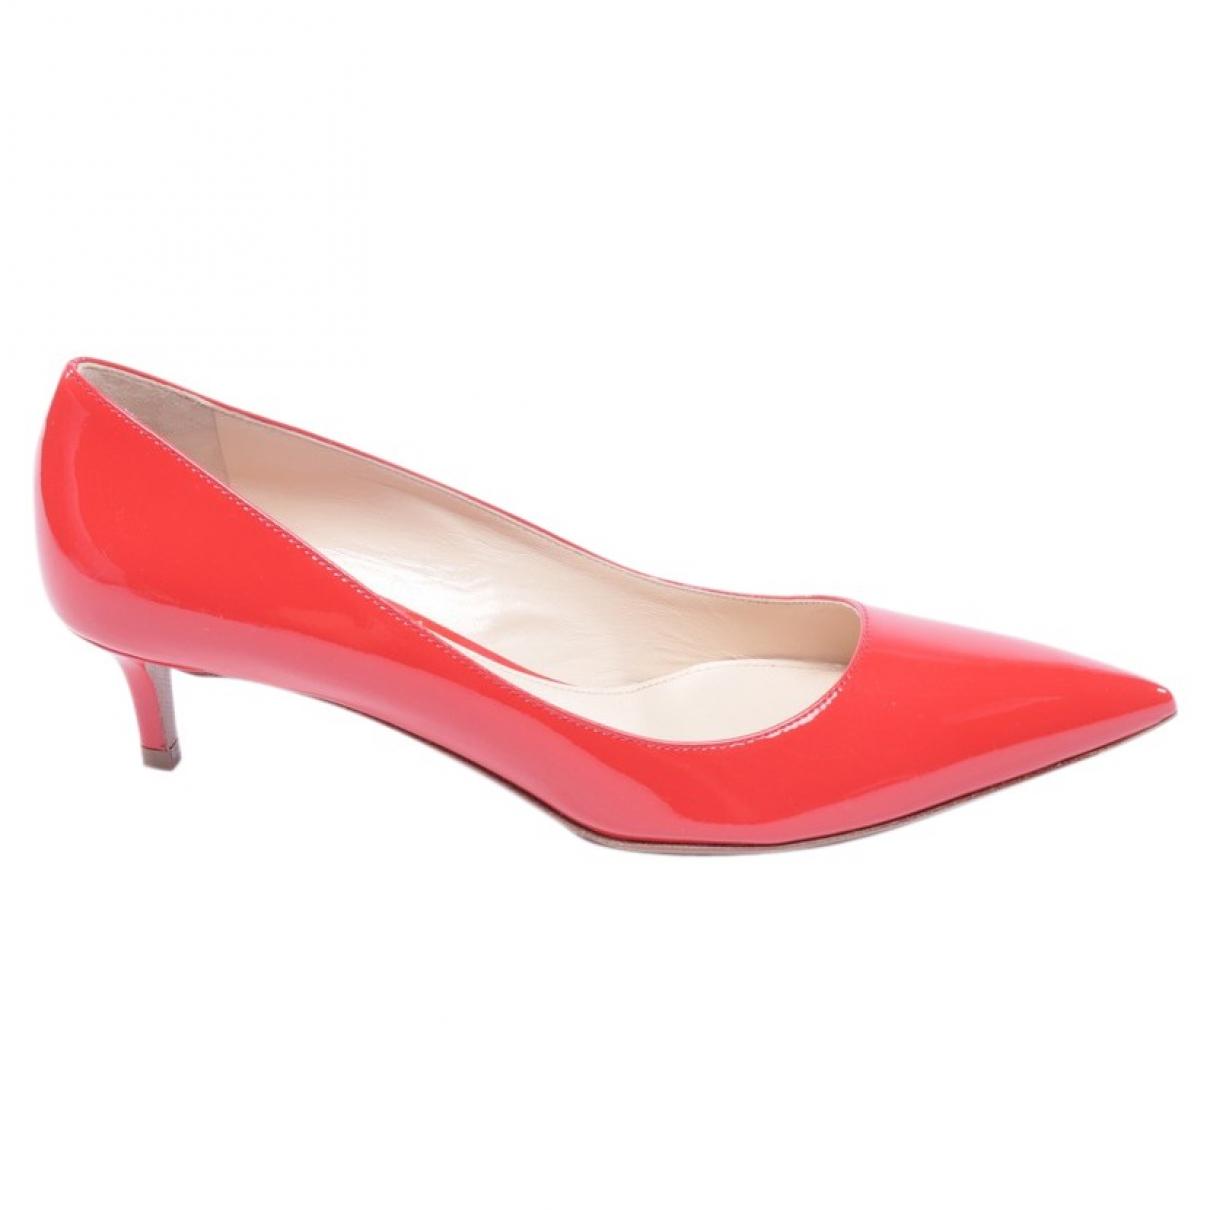 Prada \N Red Leather Heels for Women 36.5 EU